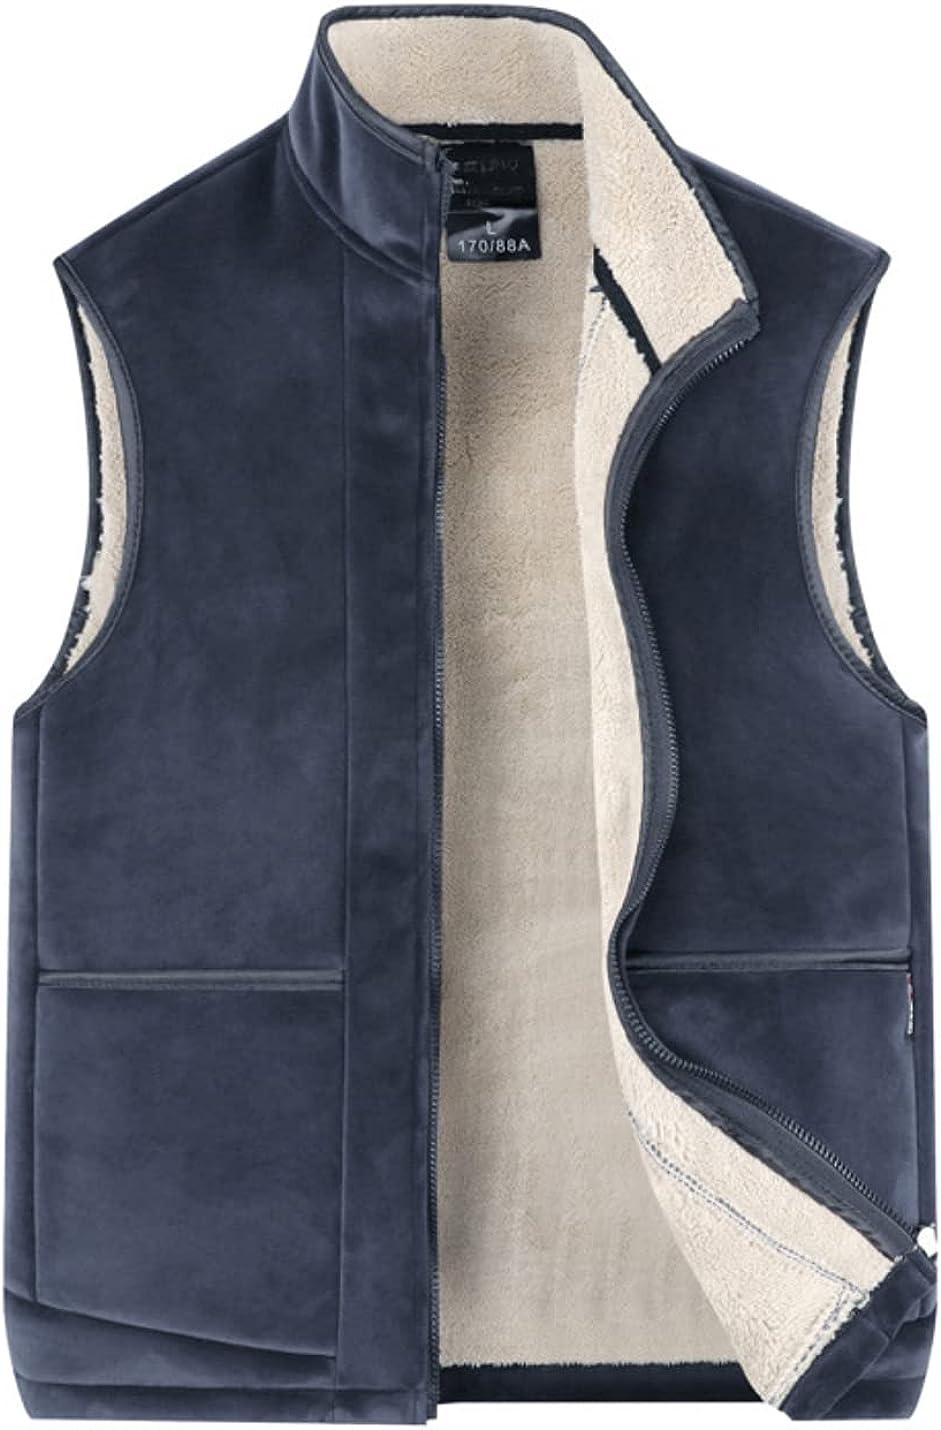 Bnigung Men's Winter Thick Fleece Lined Vest Warm Lamb wool Sleeveless Jacket Coats